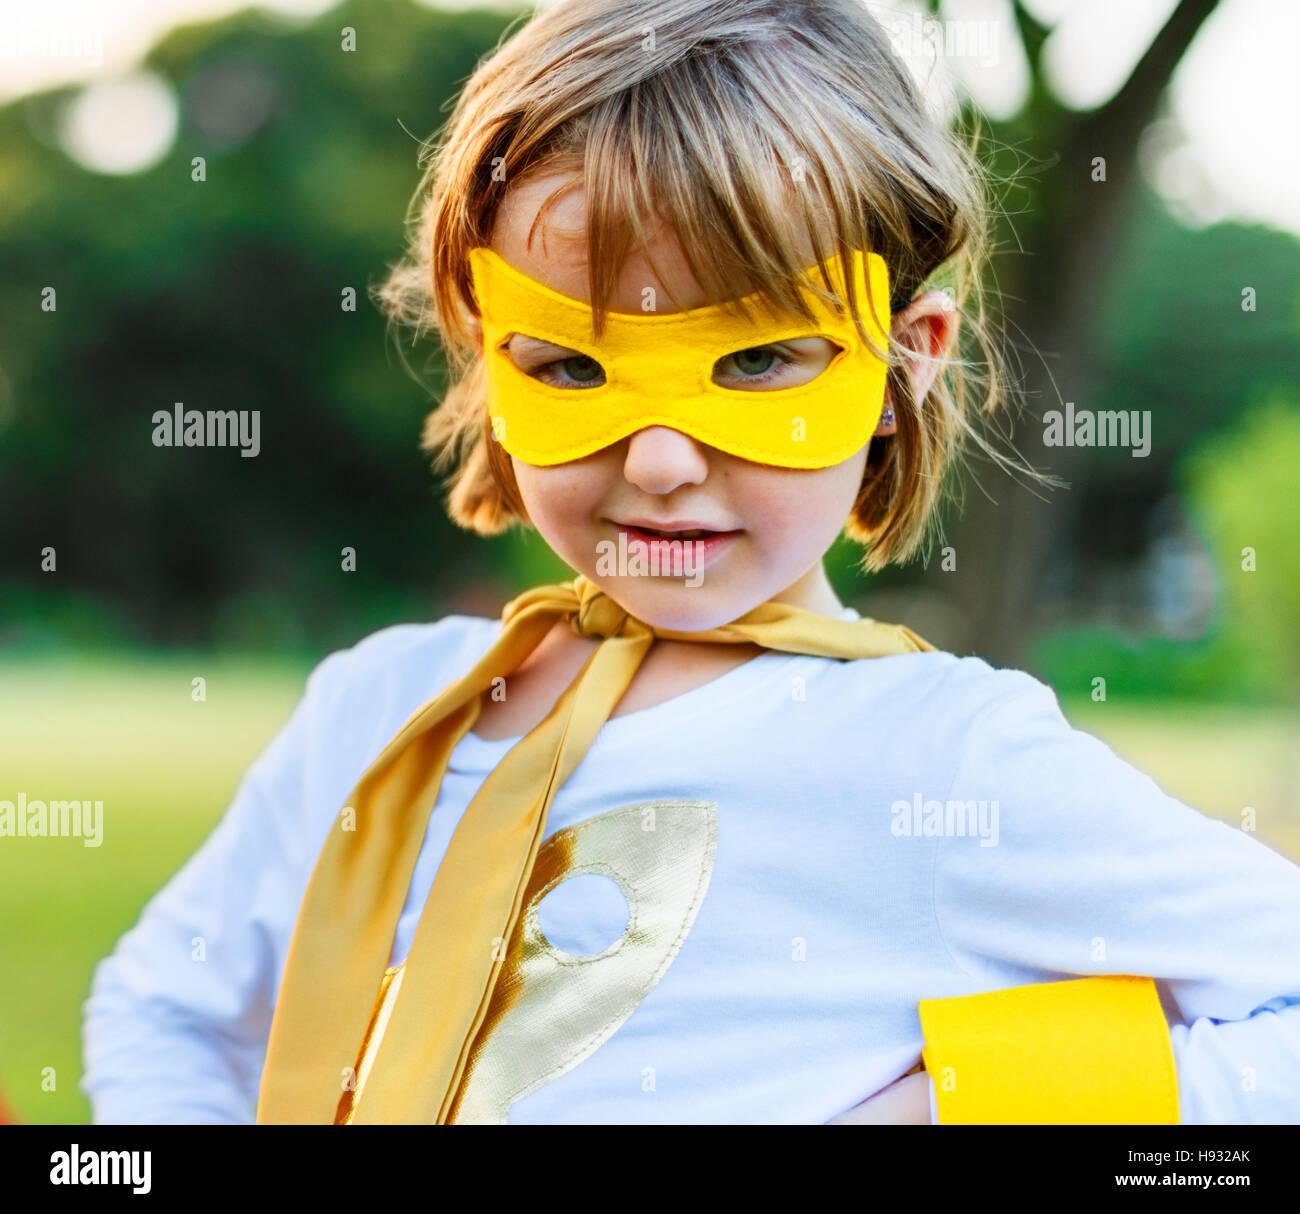 Kind Freunde jungen Mädchen Glück Natur fröhlich Konzept Stockbild